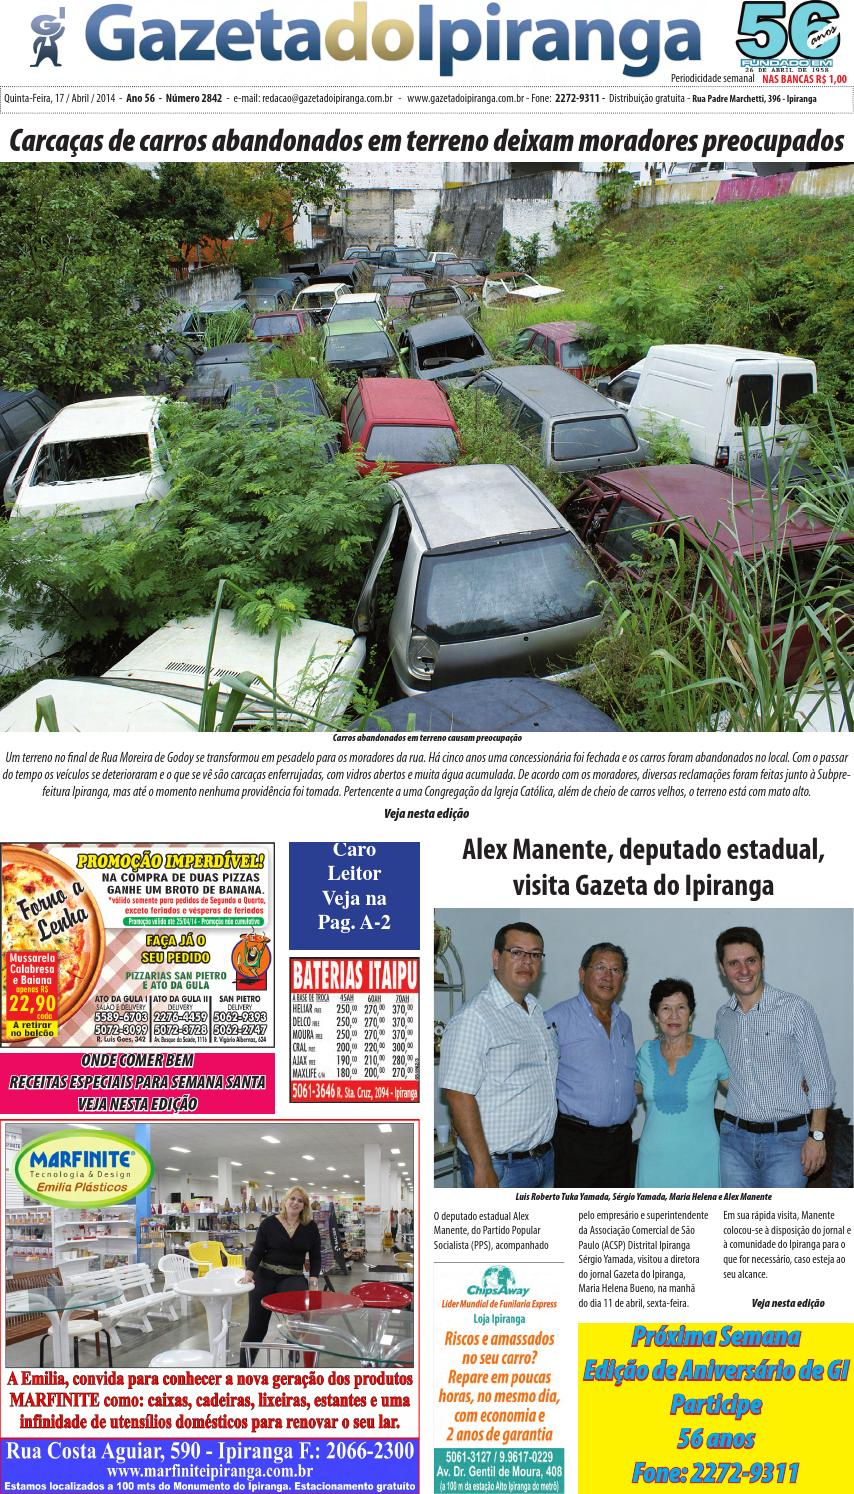 ad3b110482c6b Edicao de 17 04 2014 by Casé Oliveira - issuu